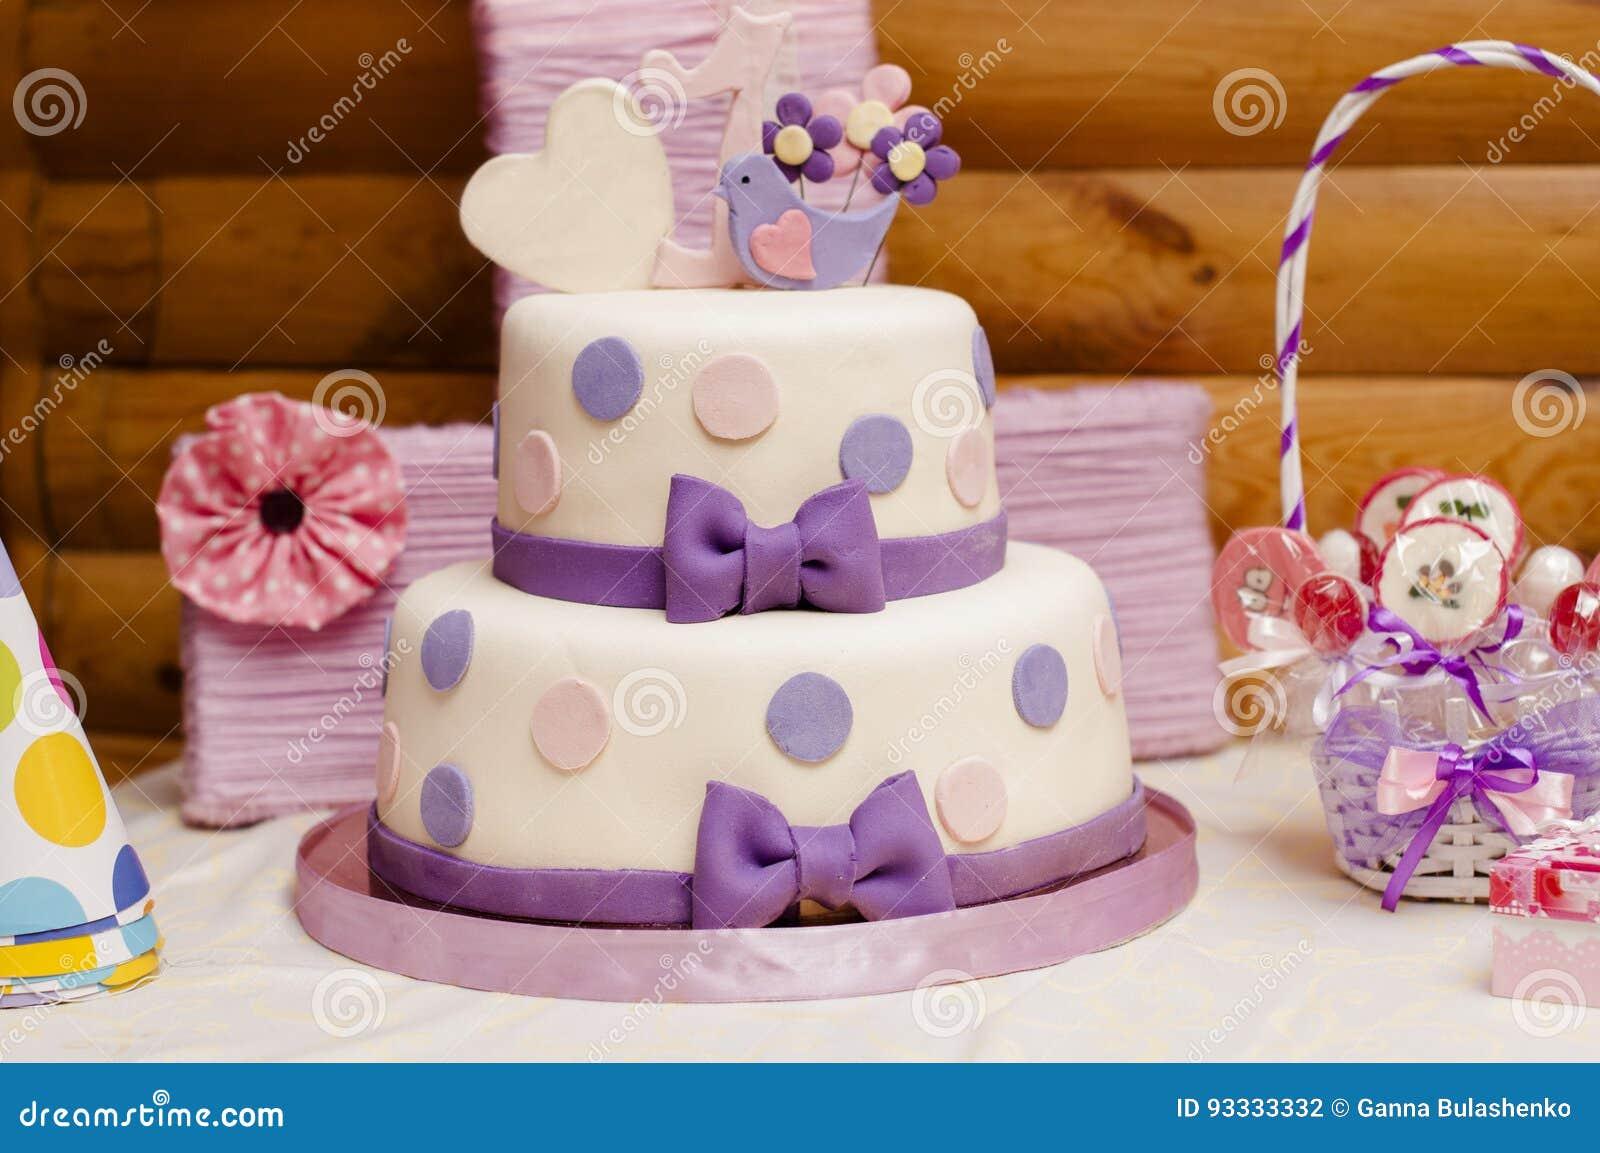 Surprising Two Tier Birthday Cake Stock Photo Image Of Food Cream 93333332 Funny Birthday Cards Online Alyptdamsfinfo